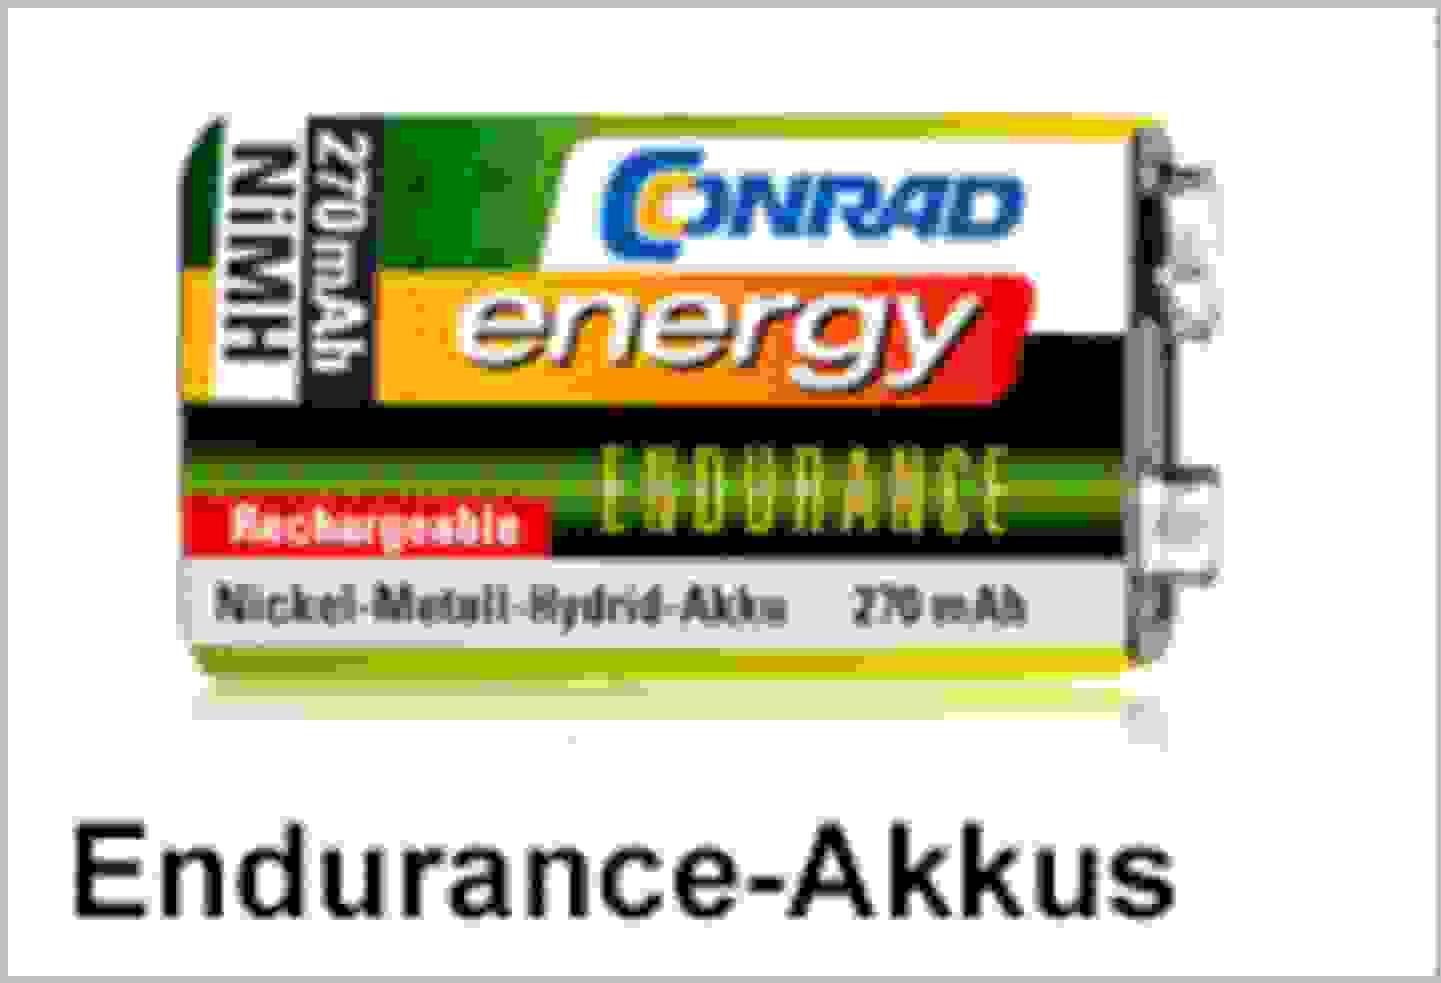 Conrad Energy Endurance-Akkus